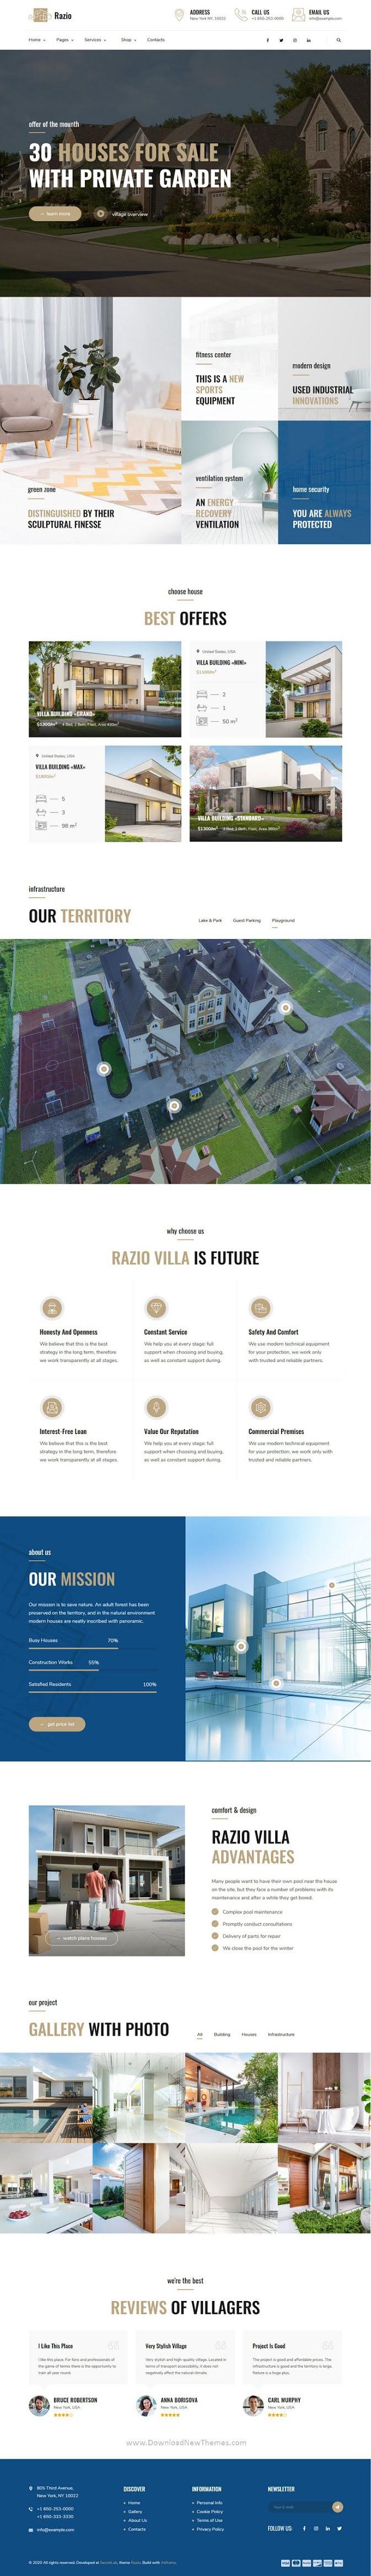 Real Estate and Housing Complex Premium WordPress Theme